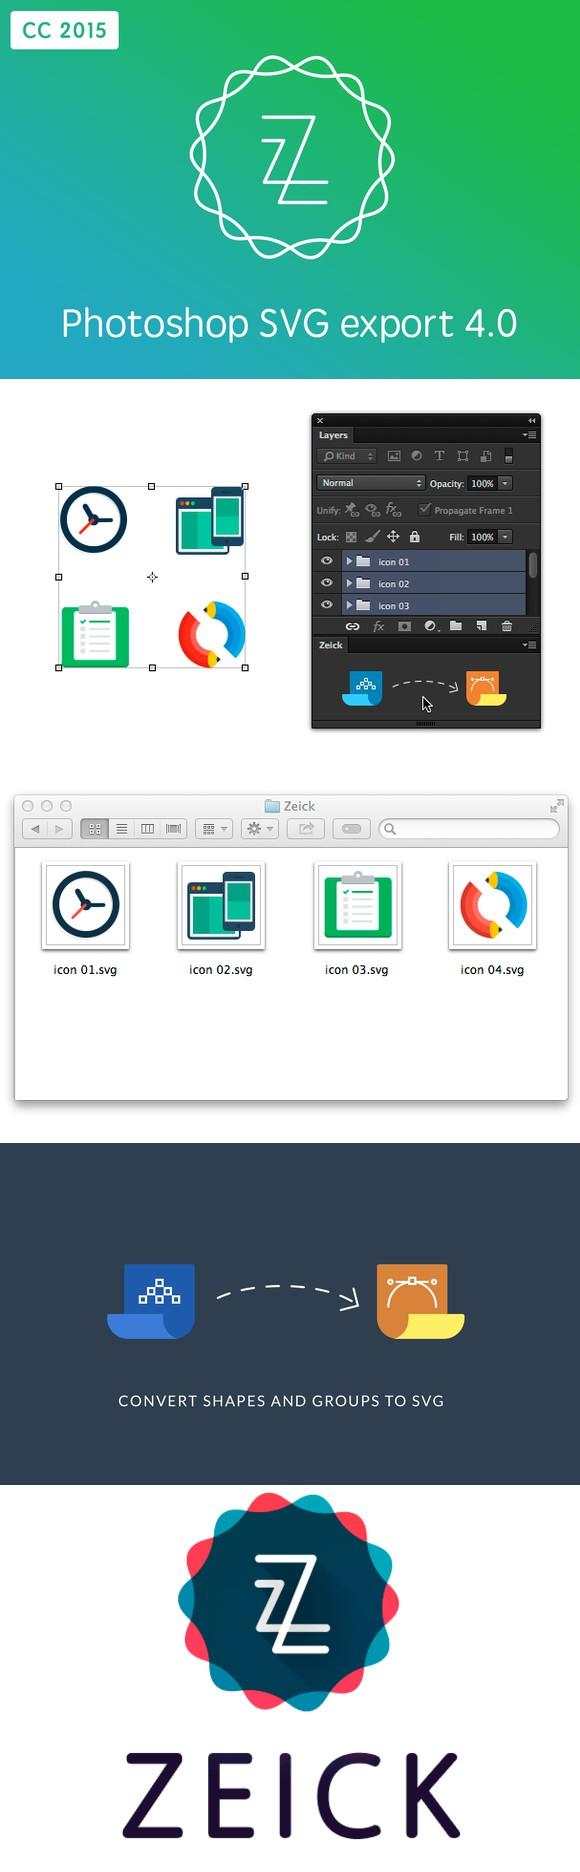 Zeick CC 2015 SVG export. Plugins. 20.00